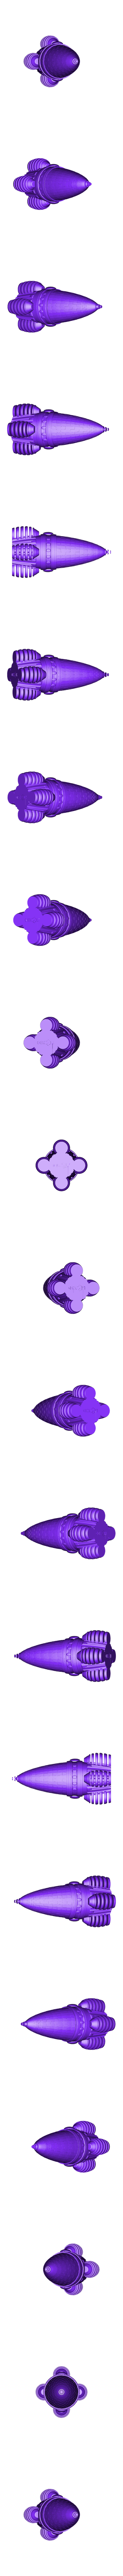 Hex3D_DualRocket_Part1.stl Download free STL file Dual Extrusion Rocket • 3D printing design, Geoffro